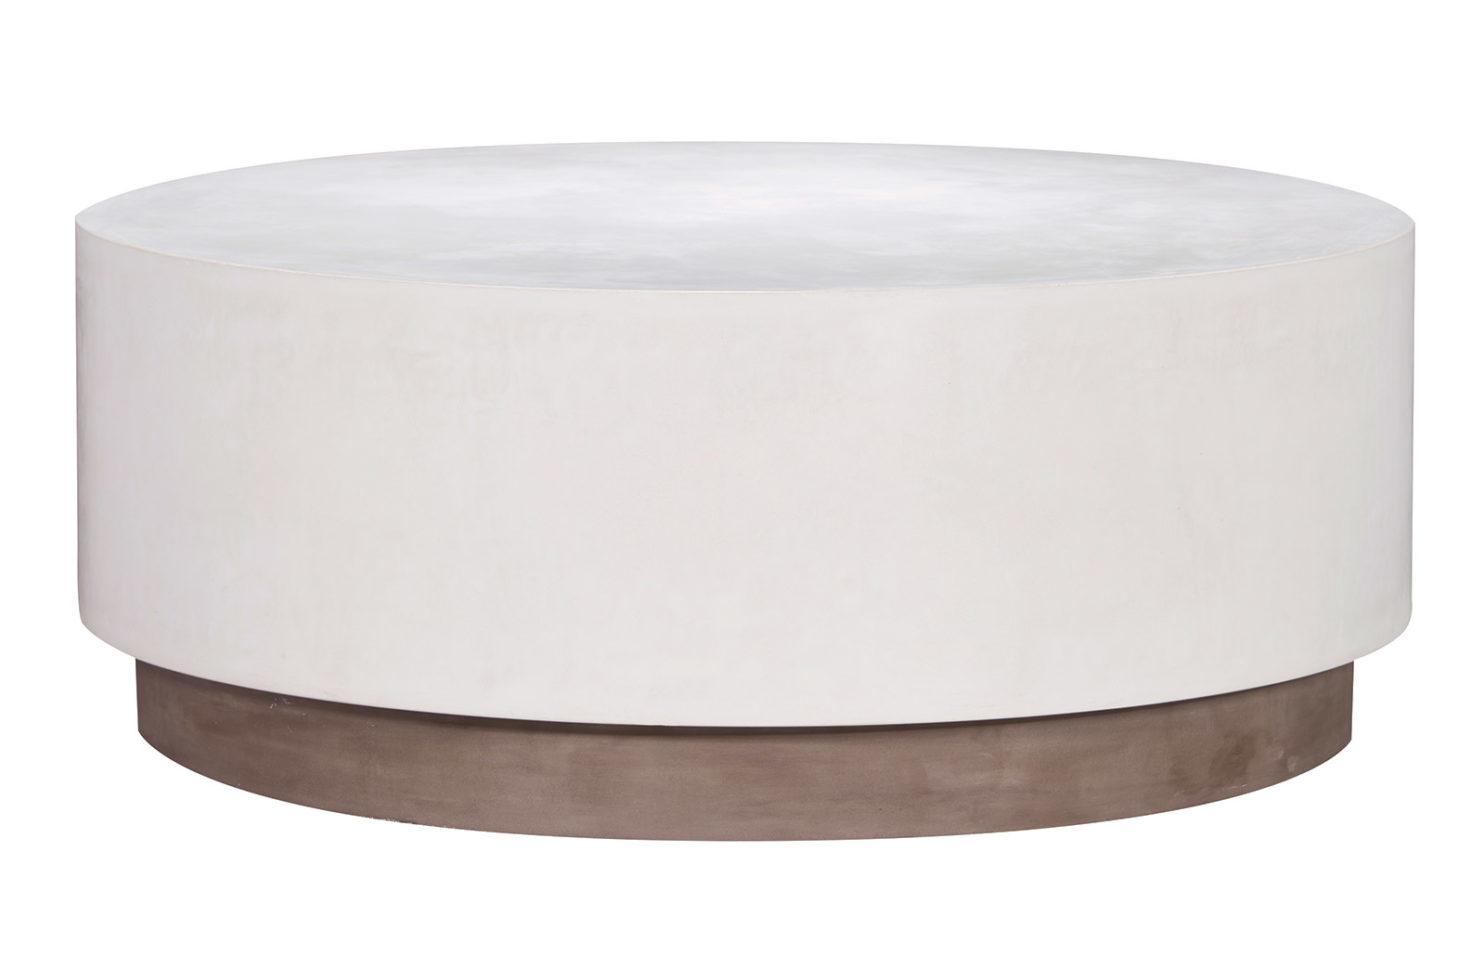 Perpetual poncho coffee table 501FT185P2WG